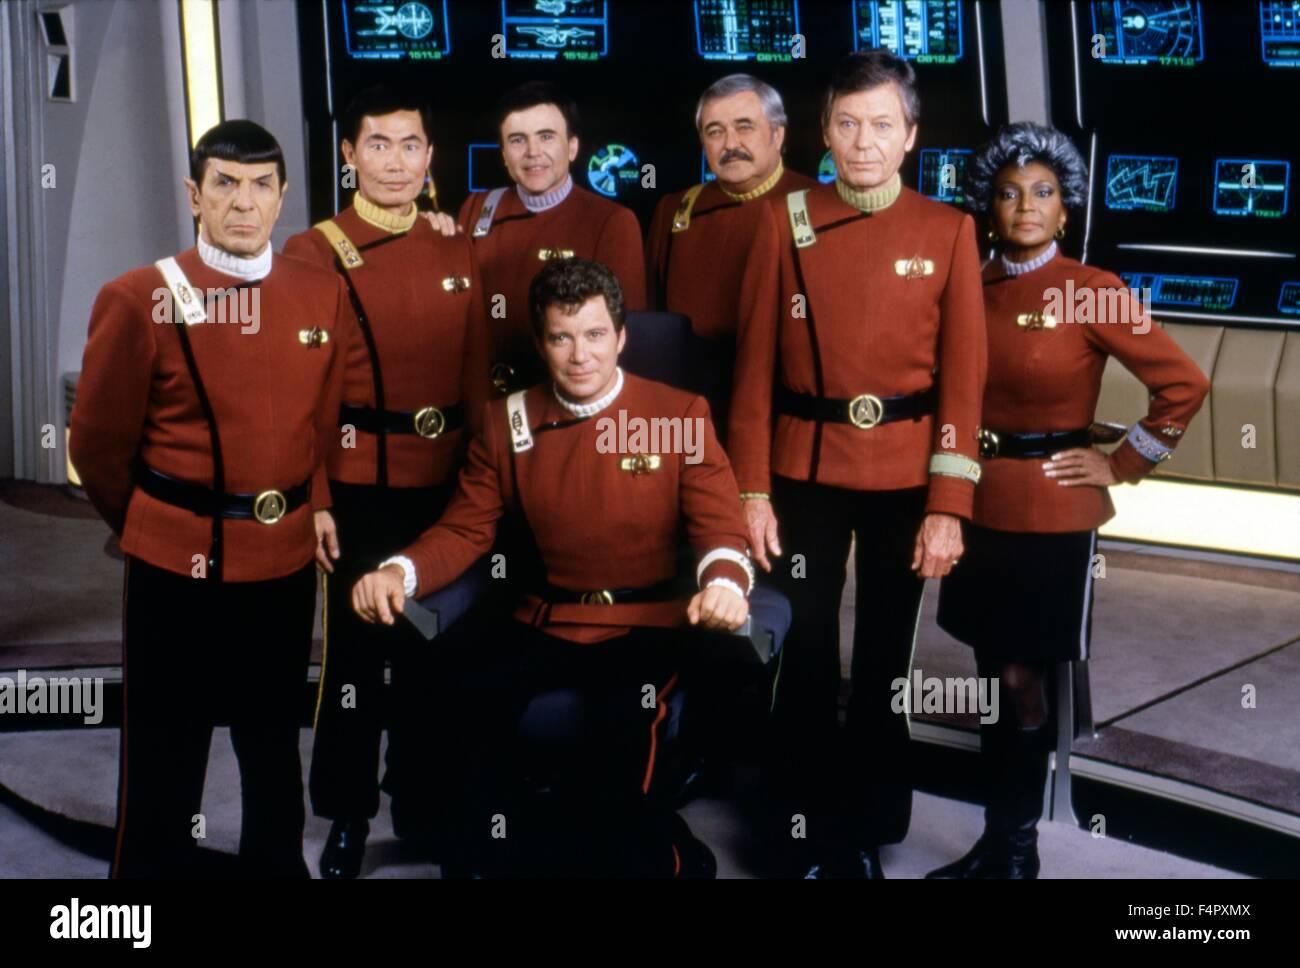 Leonard Nimoy, George Takei, Walter Koenig, William Shatner, DeForest Kelley and Michelle Nichols / Star Trek V - Stock Image